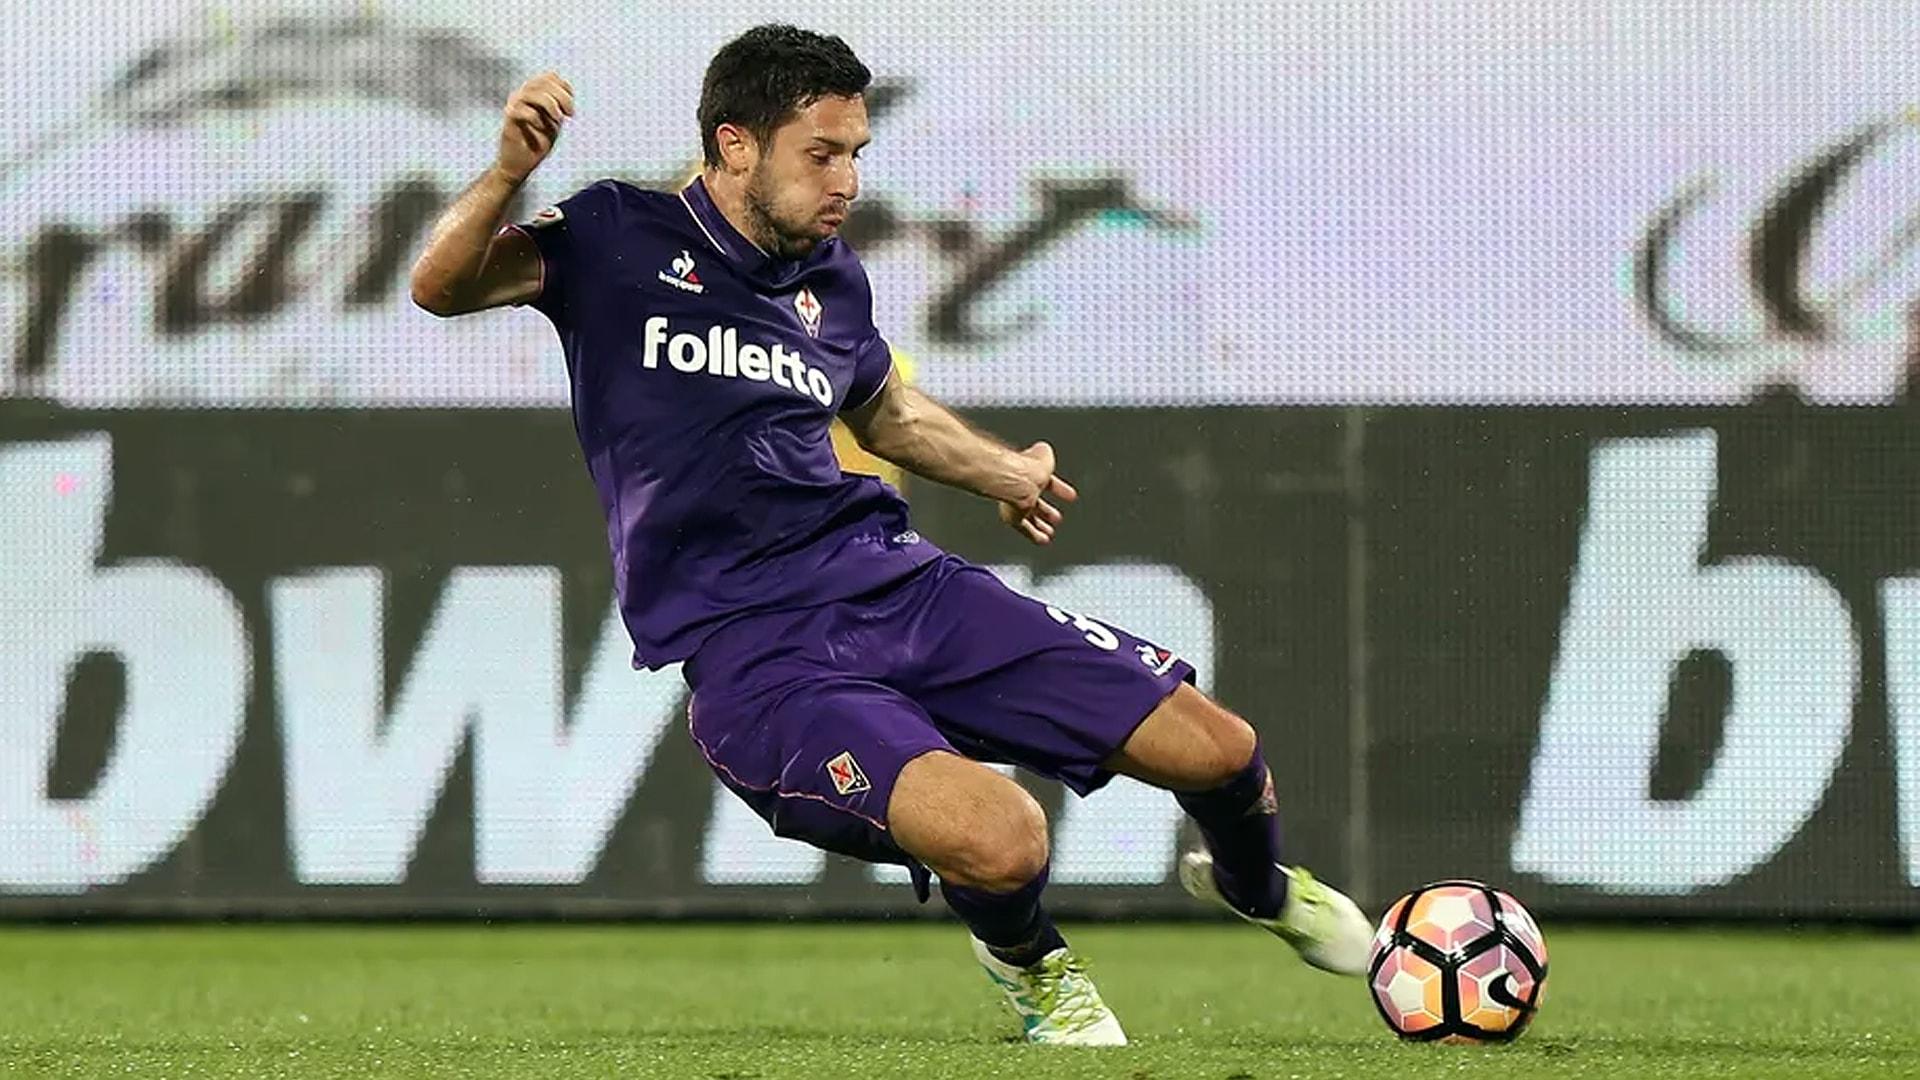 Fiorentina-فیورنتینا-سری آ- Crotone-Serie A